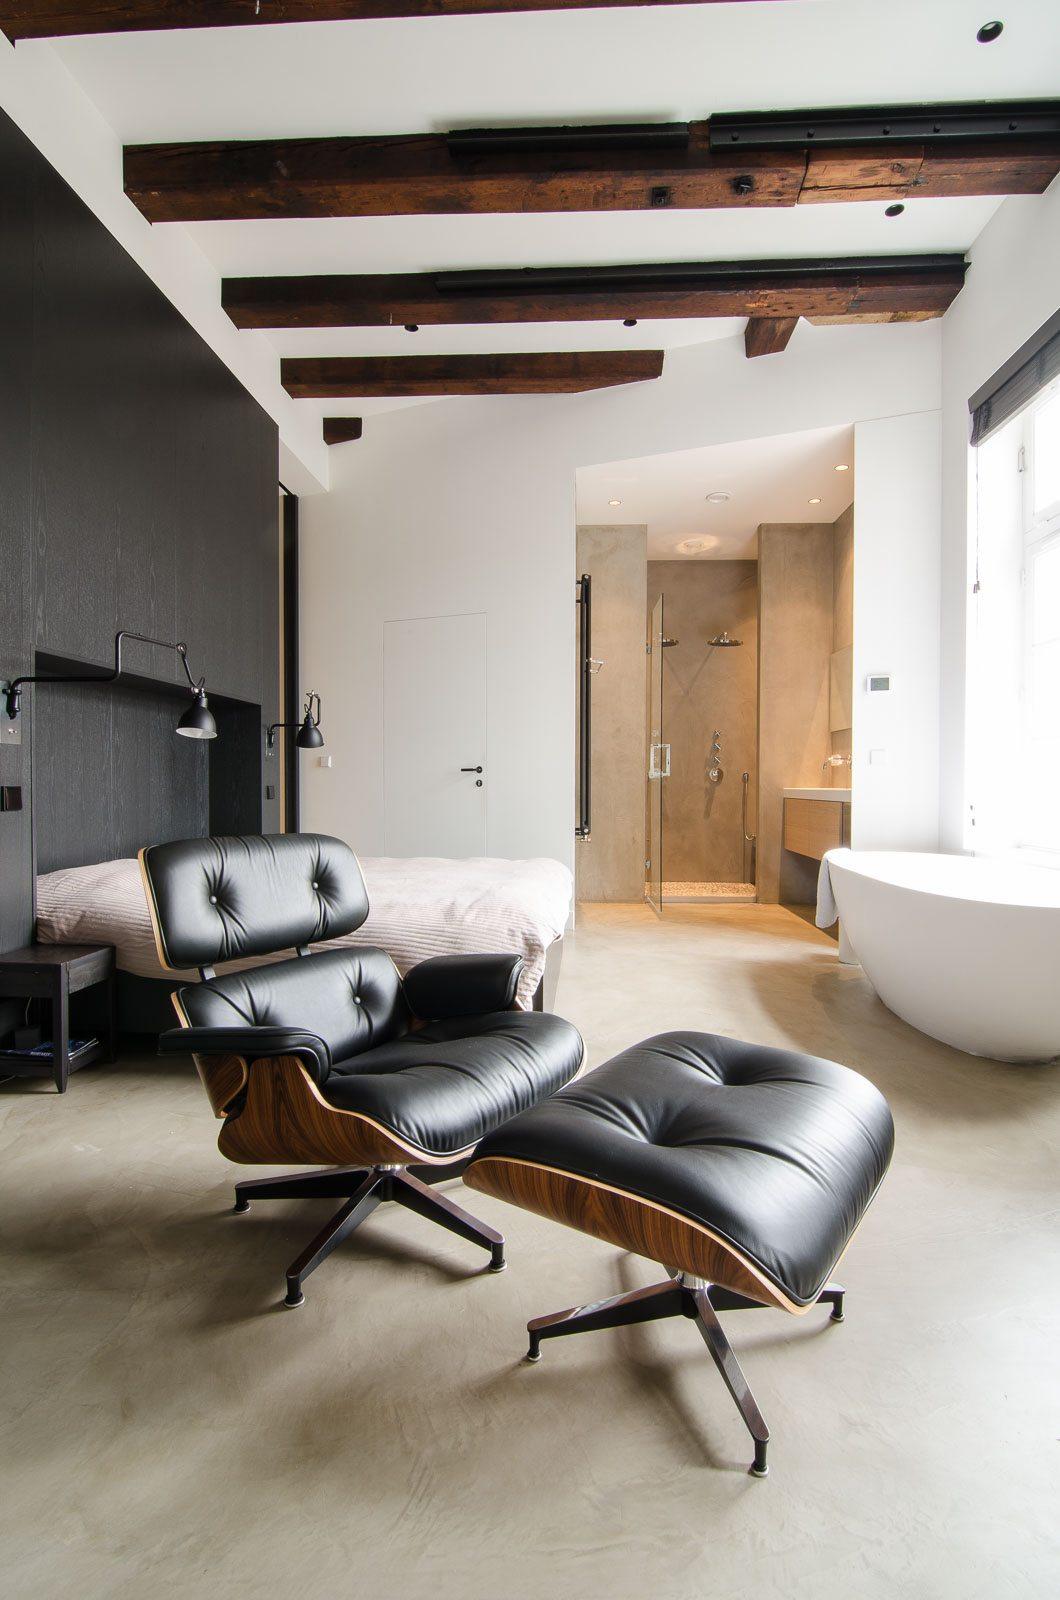 Industrieel loft appartement van 150m2 uit amsterdam for Loft appartement